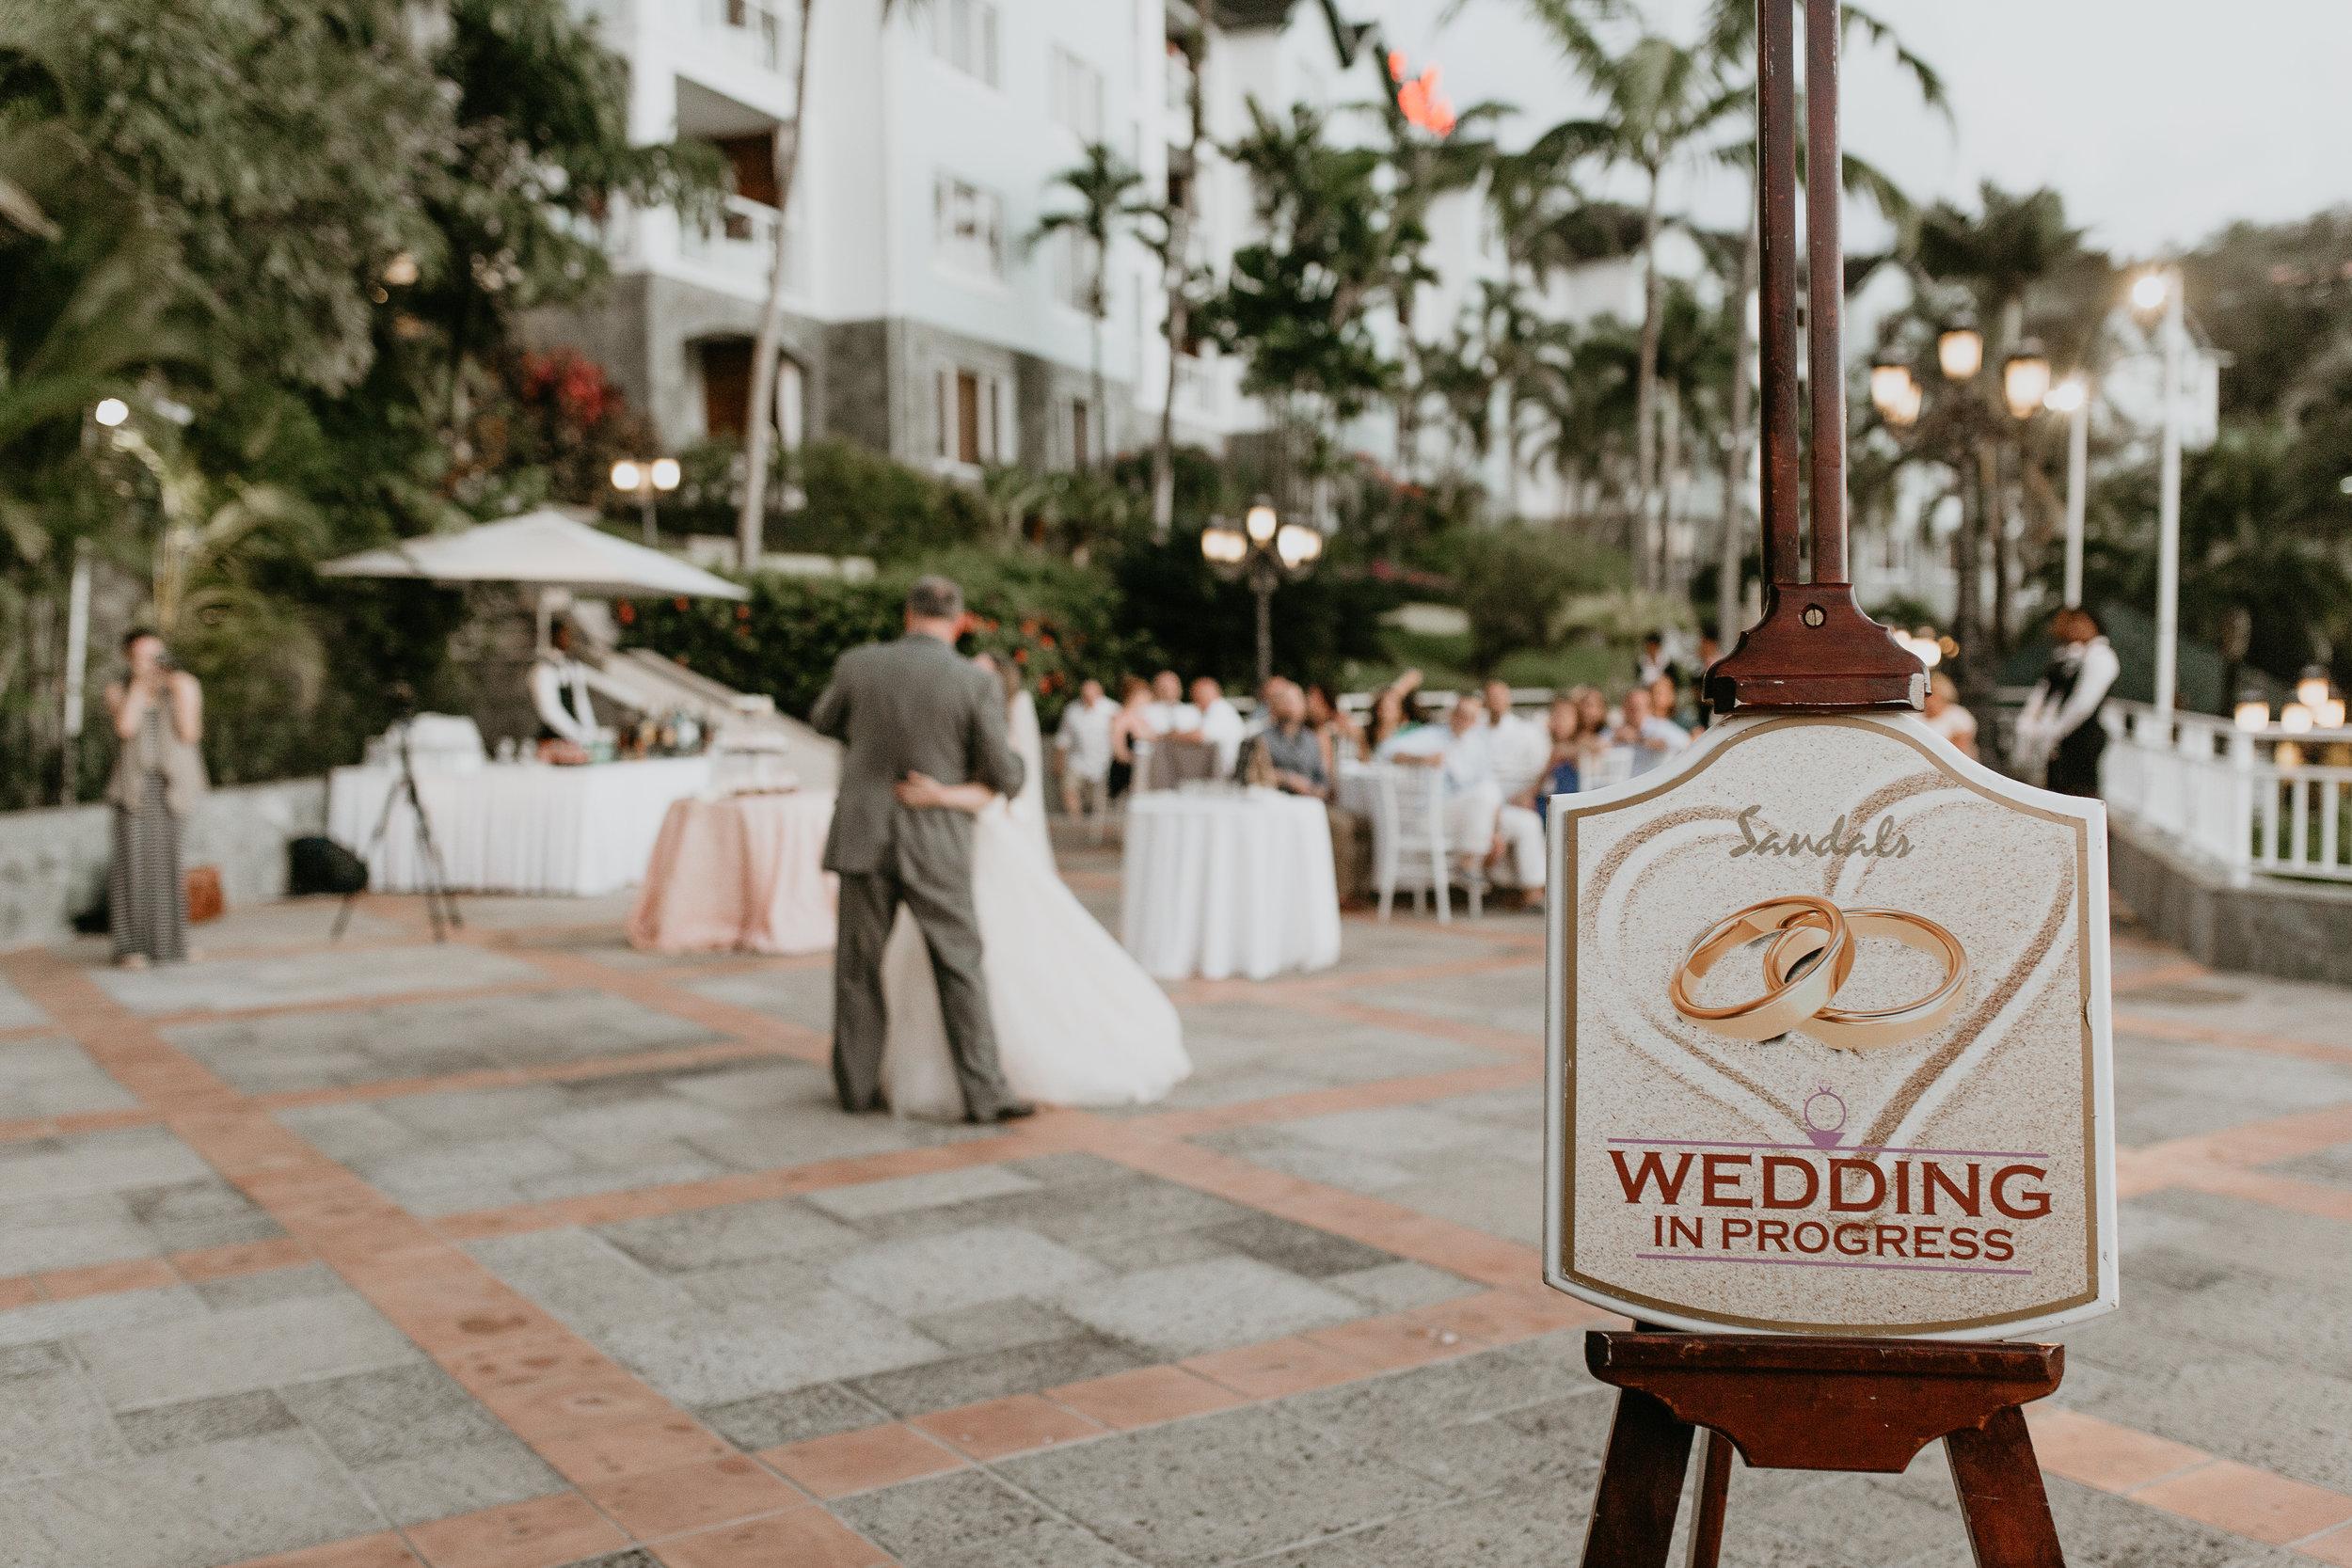 nicole-daacke-photography-destination-wedding-in-st-lucia-sandals-la-toc-intimate-island-wedding-carribean-elopement-photographer-chill-island-wedding-138.jpg